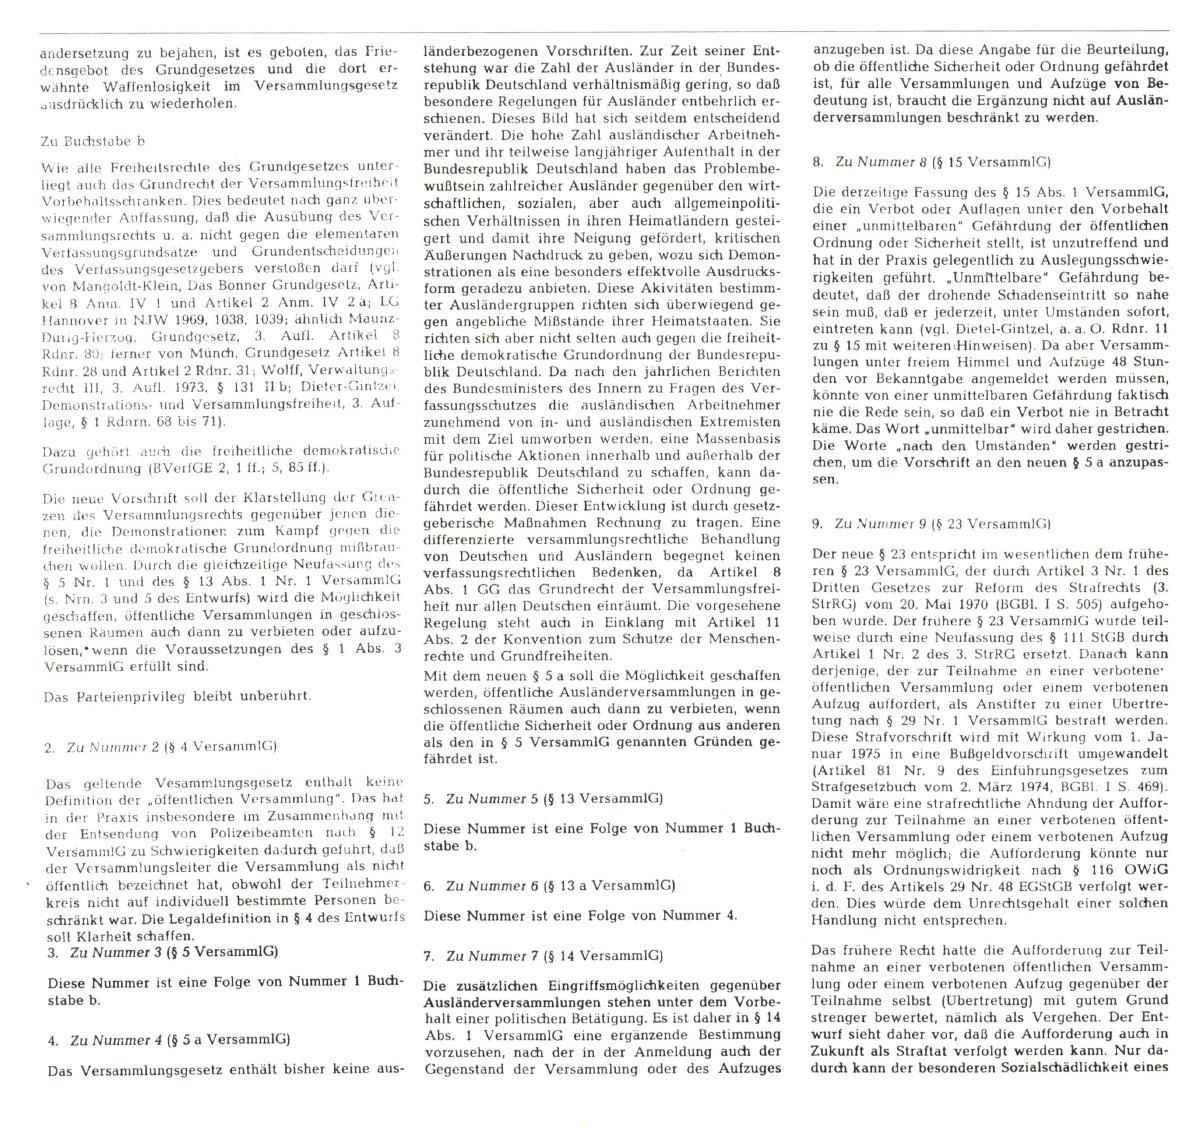 REP_VLB_1976_Die_Zensurgesetze_55